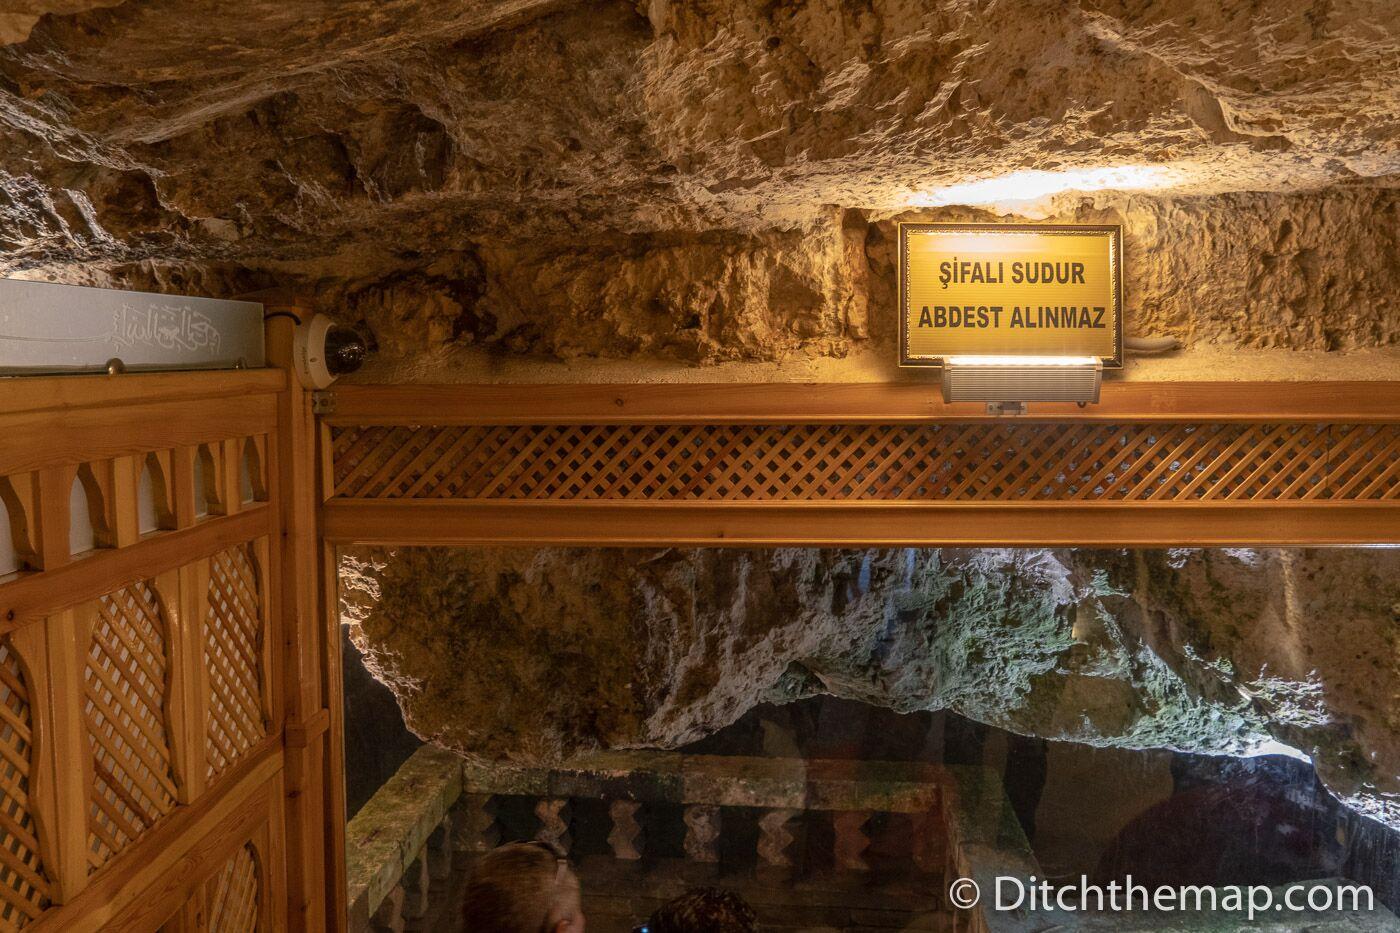 Inside Abraham's cave in Sanliurfa, Turkey